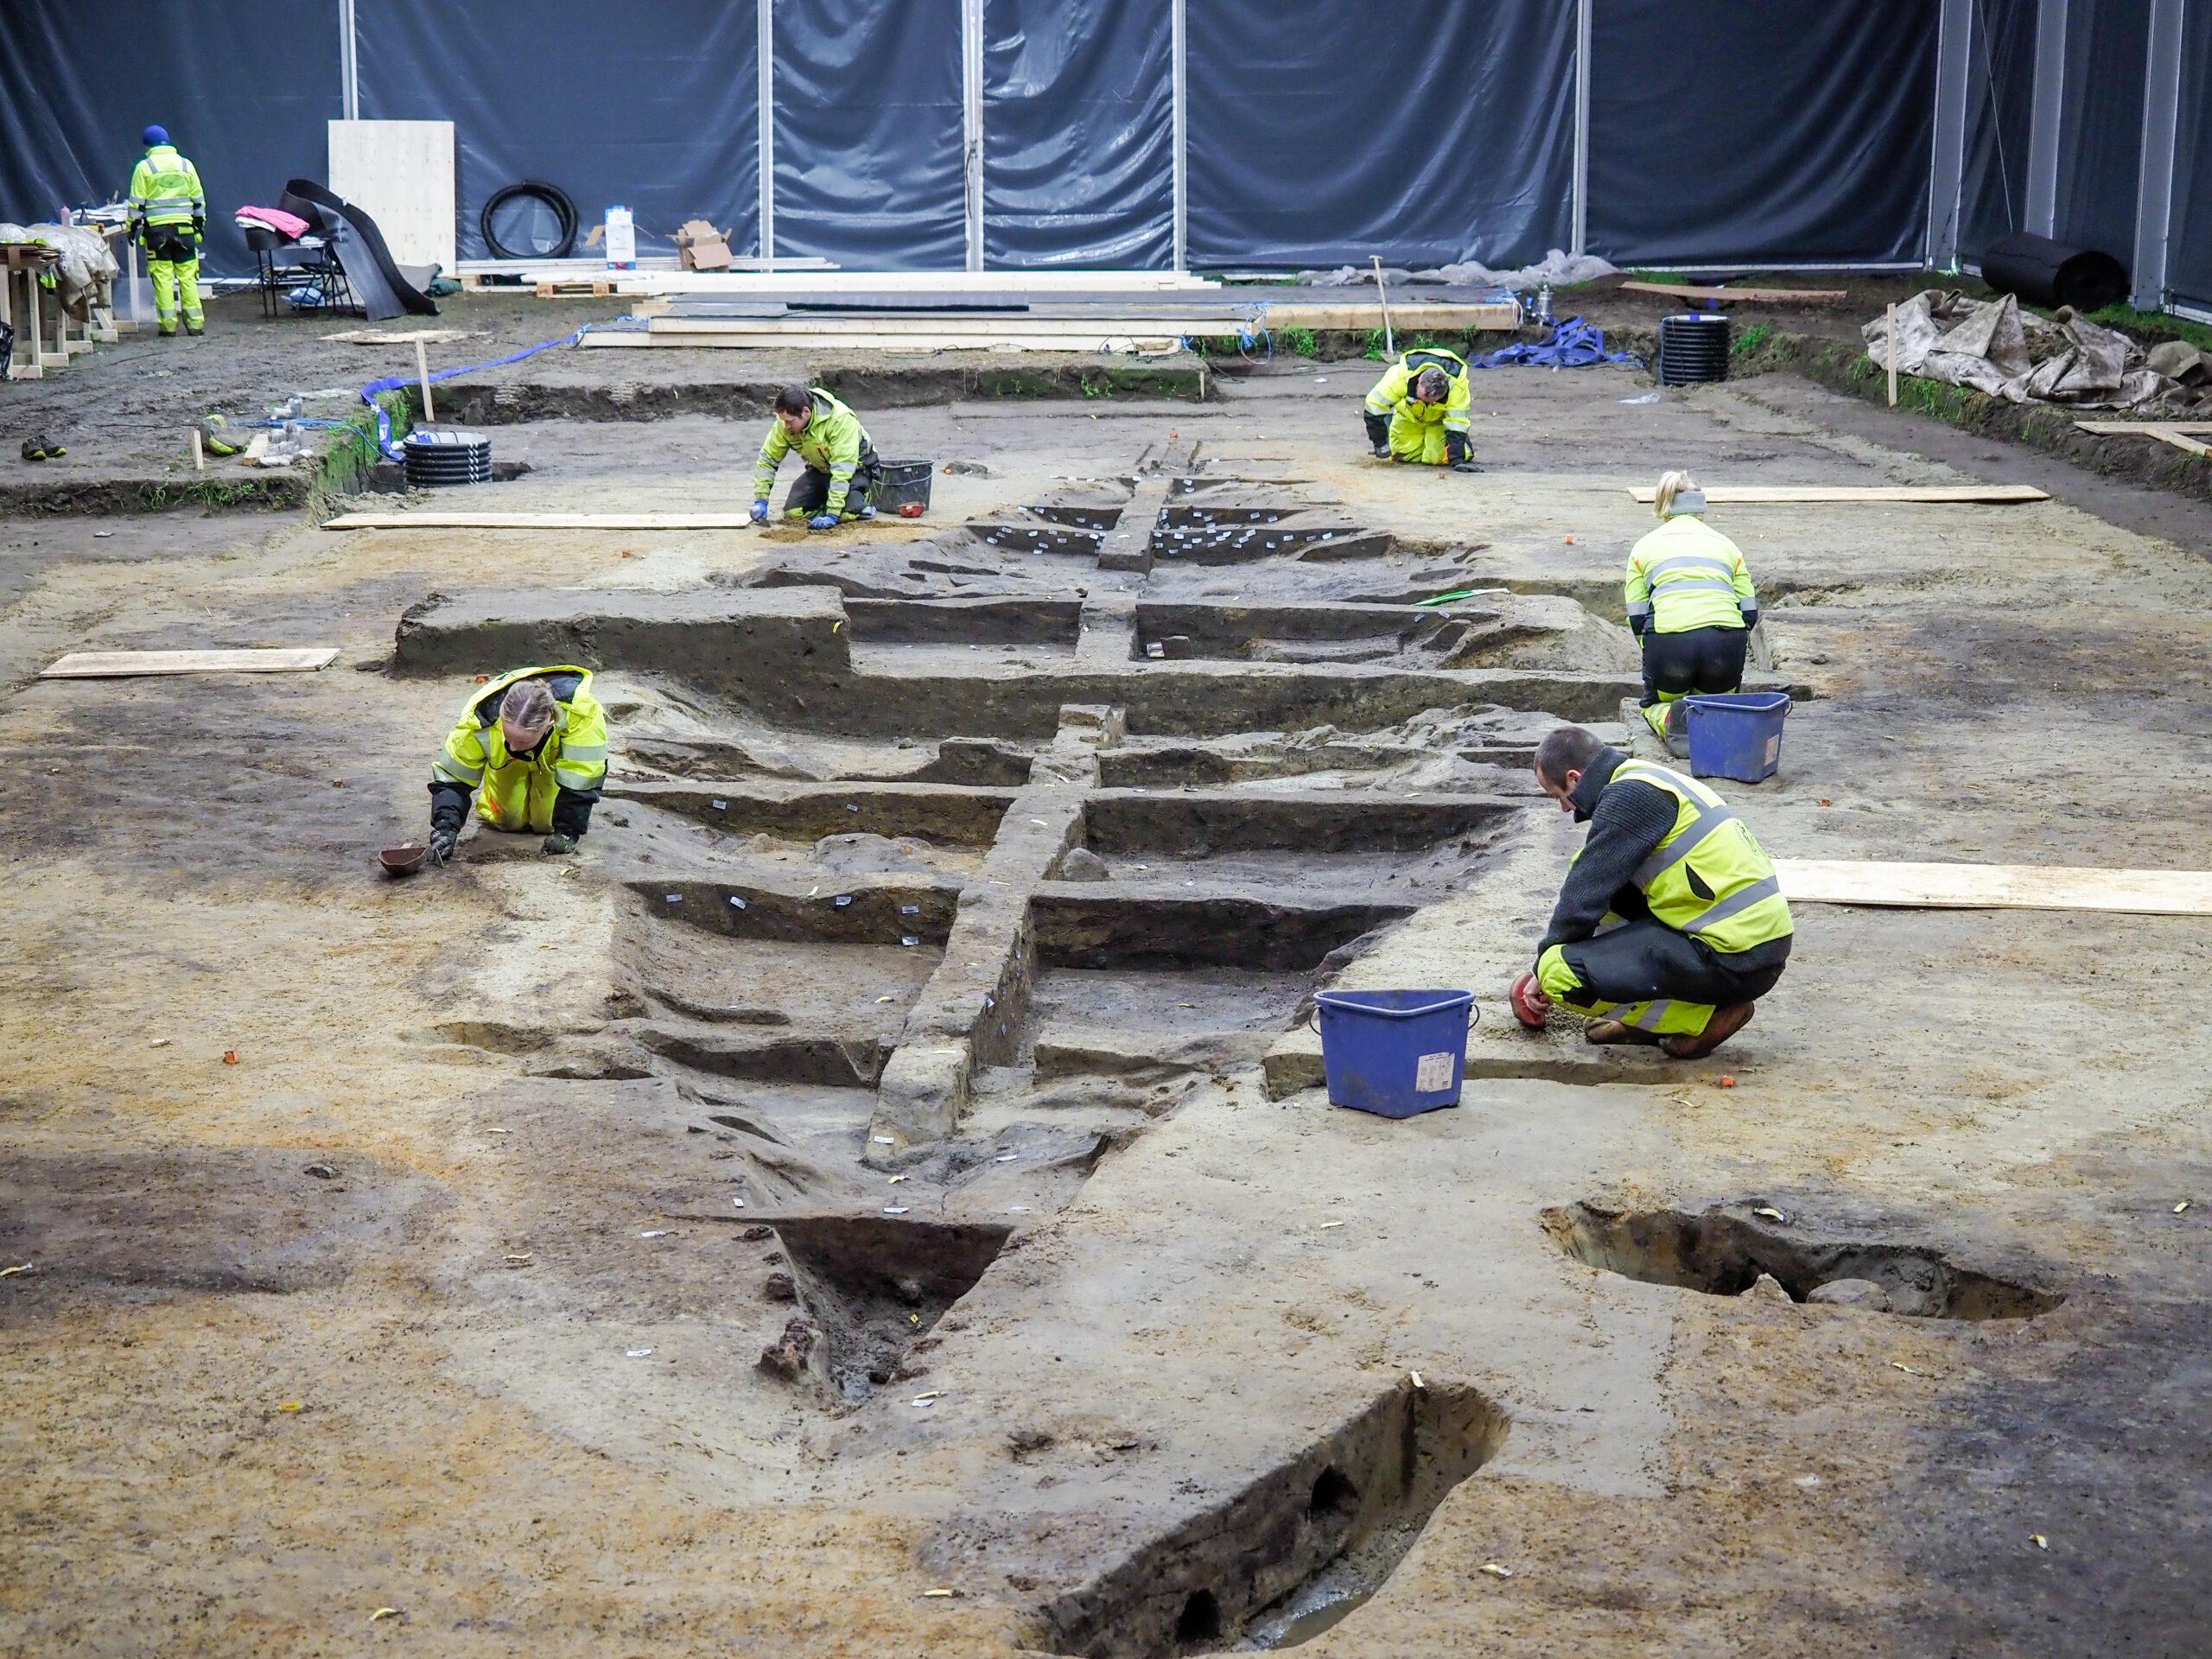 Ship shape: Viking burial found